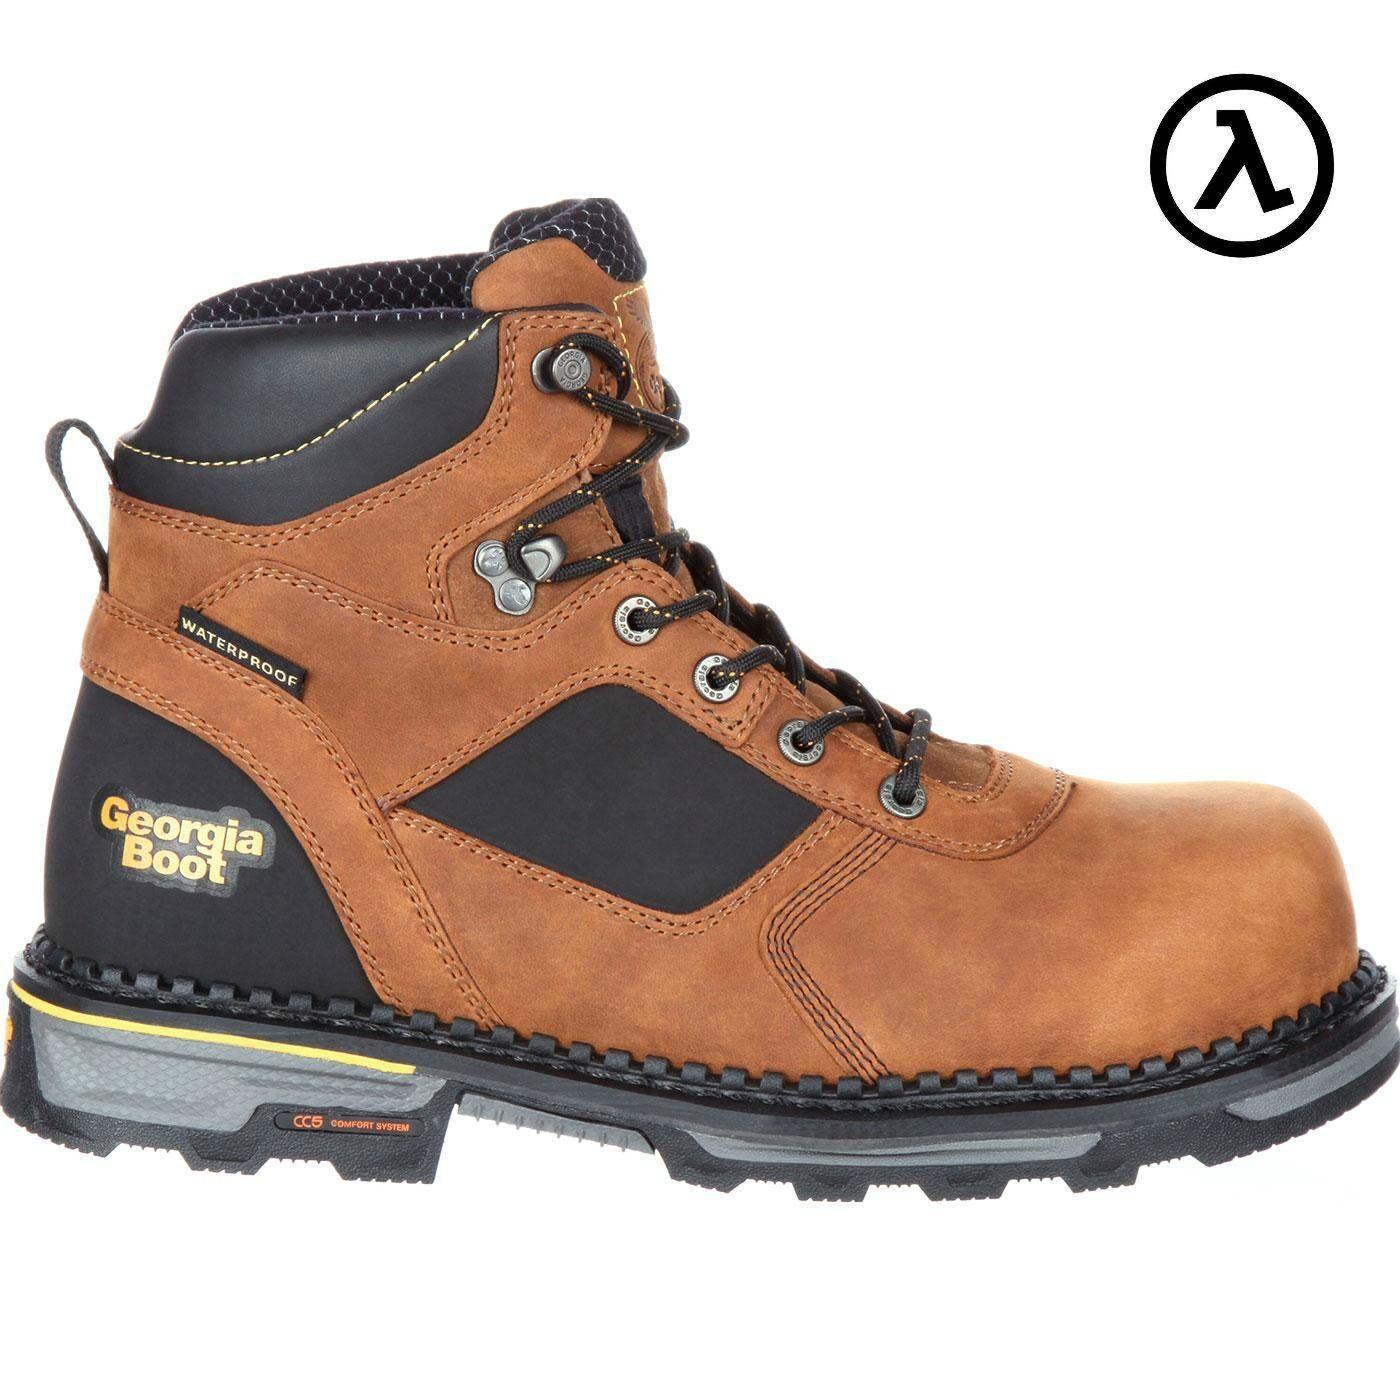 Georgia bota Martillo HD Composite Toe Impermeable botas De Trabajo GB00131  Venta